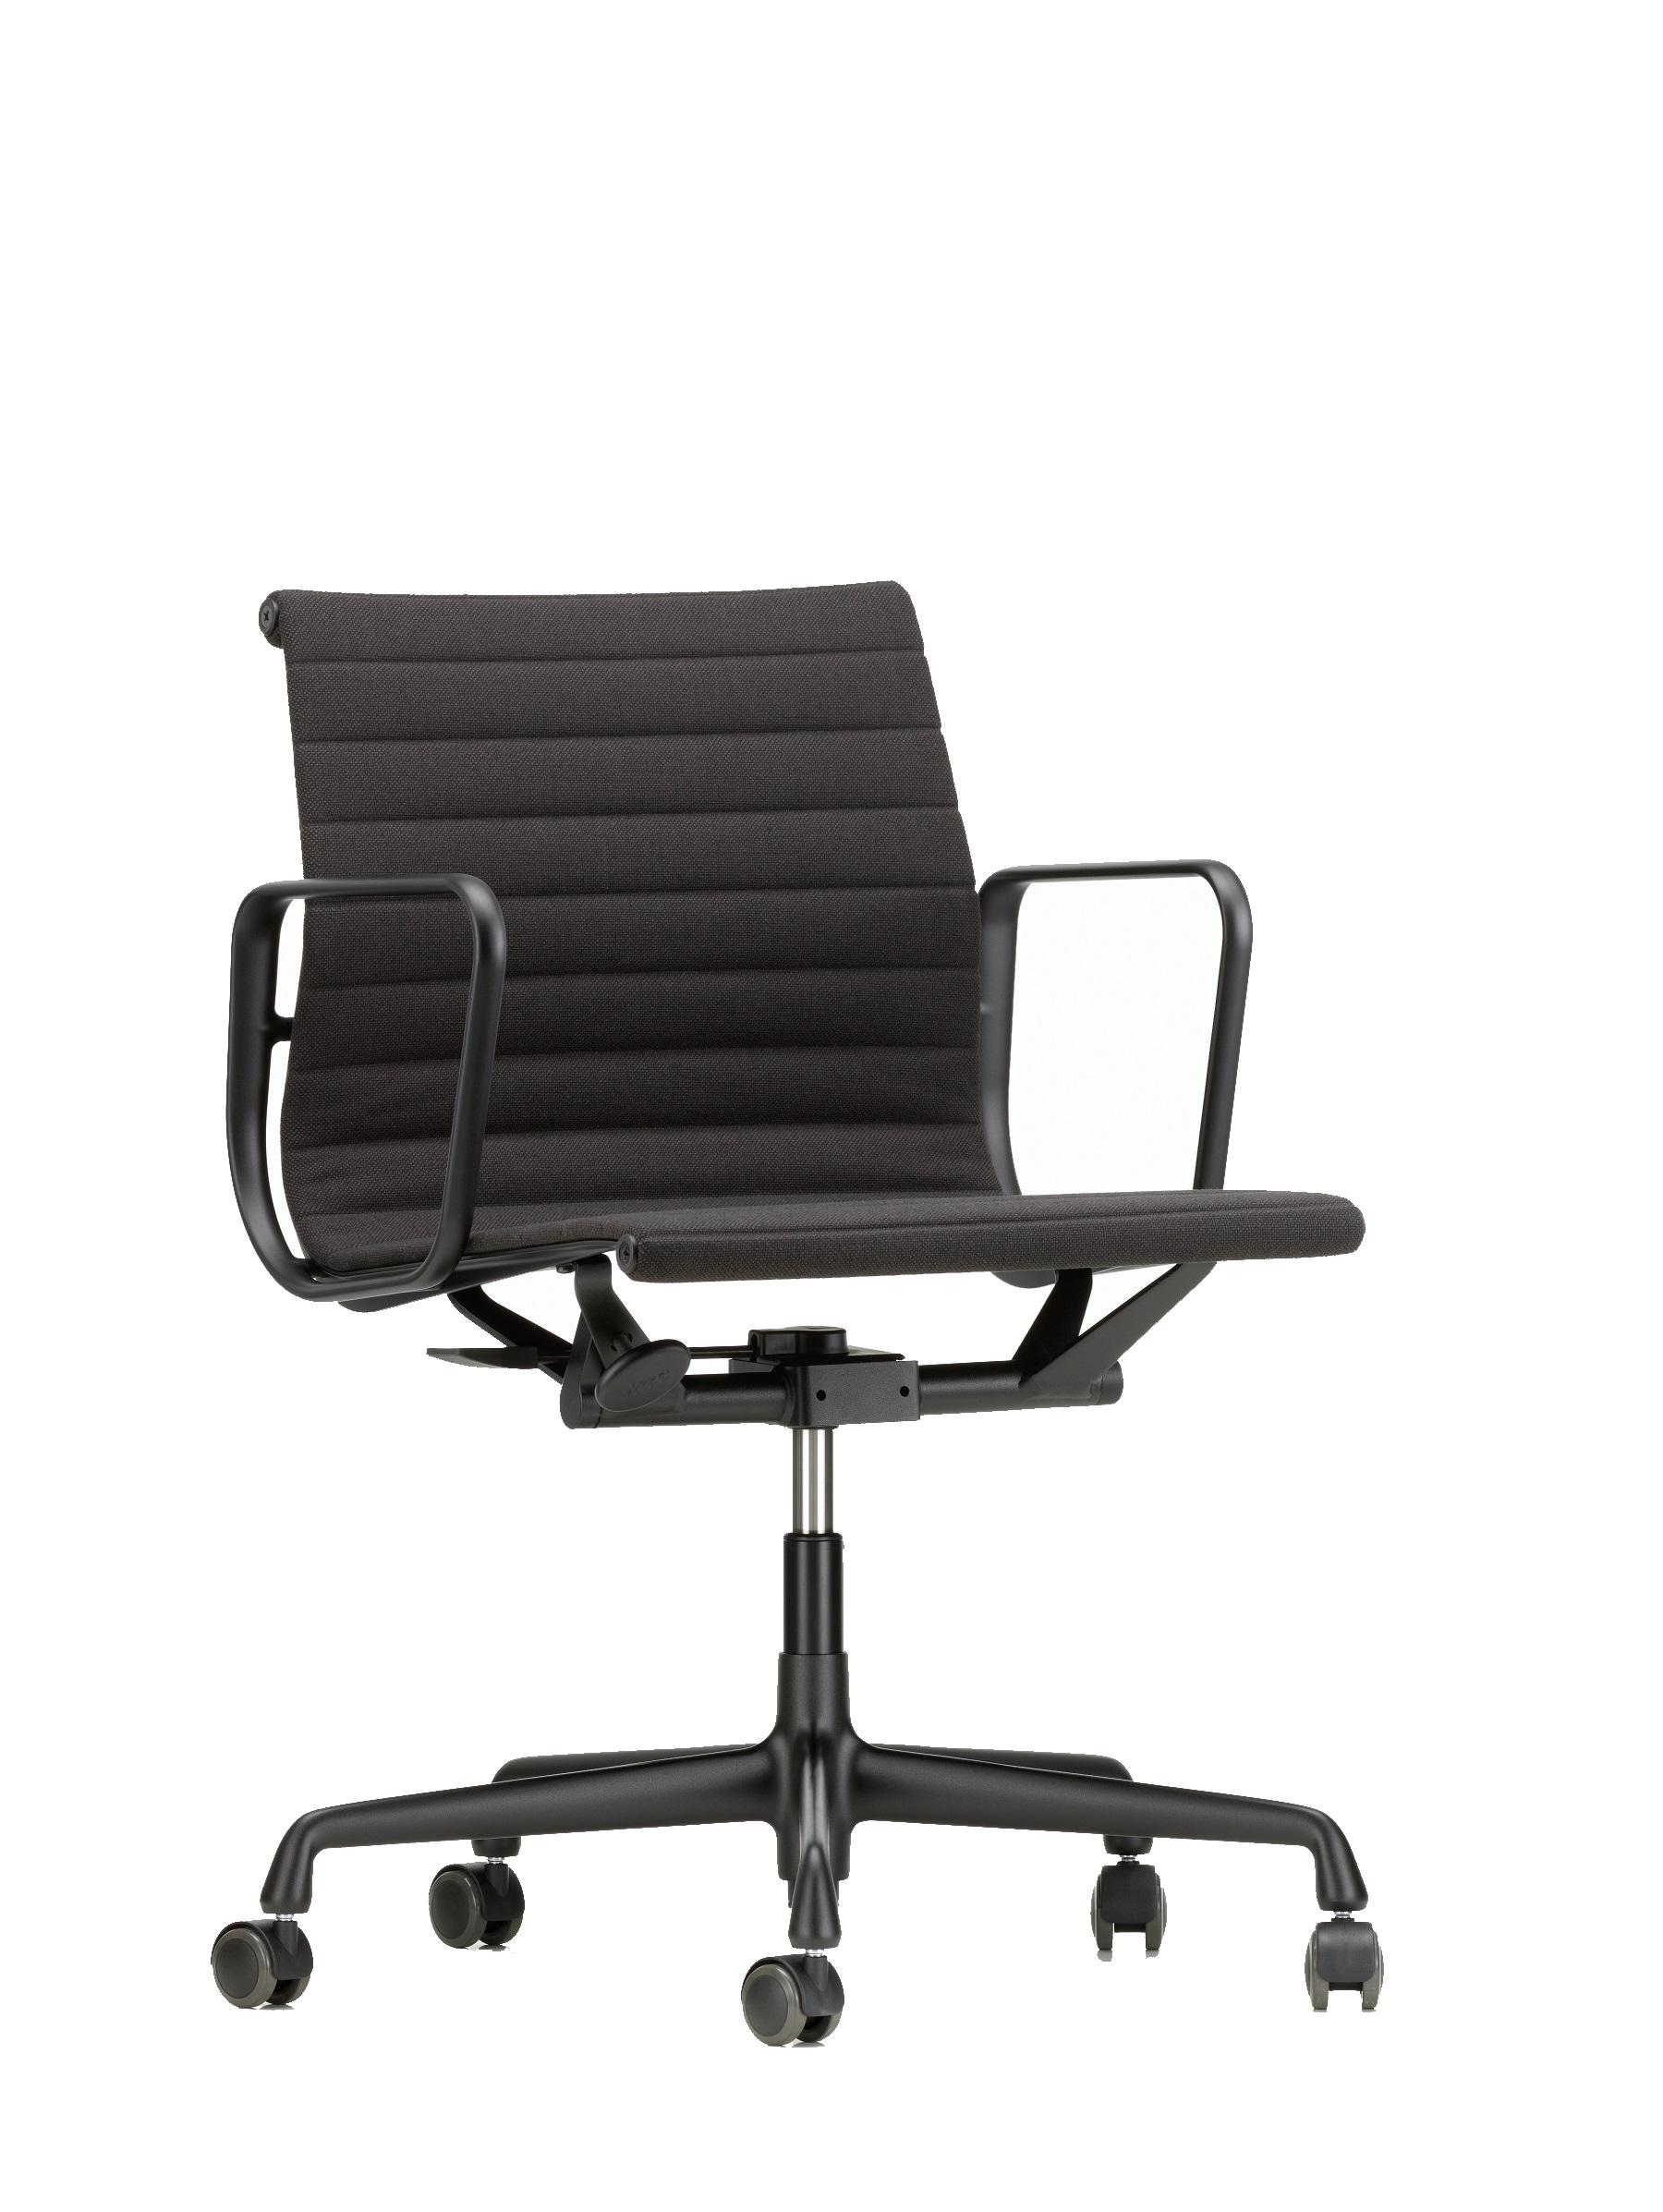 Vitra Eames Aluminium Chair Ea 117 Burostuhl Black Edition Mittelhoher Rucken Designikonen Designmobel Shop